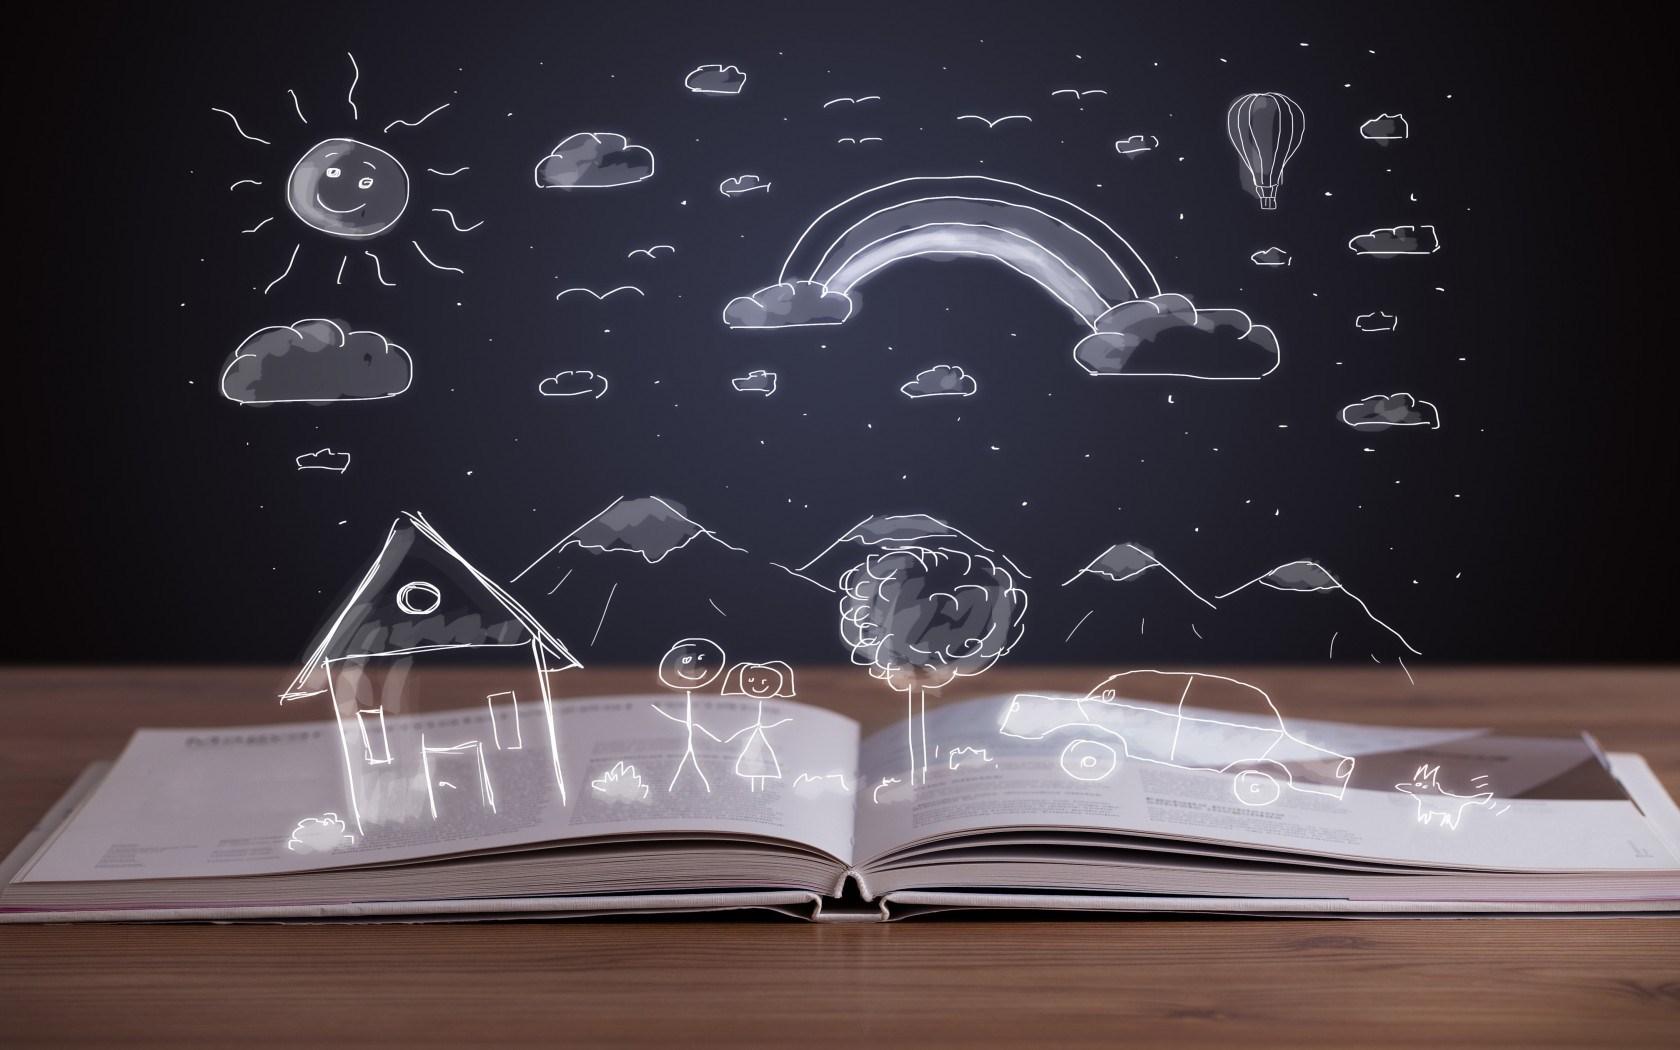 book-open-drawing-house-mountains-clouds-sun-car-girl-boy-dog-1.jpg (1680×1050)